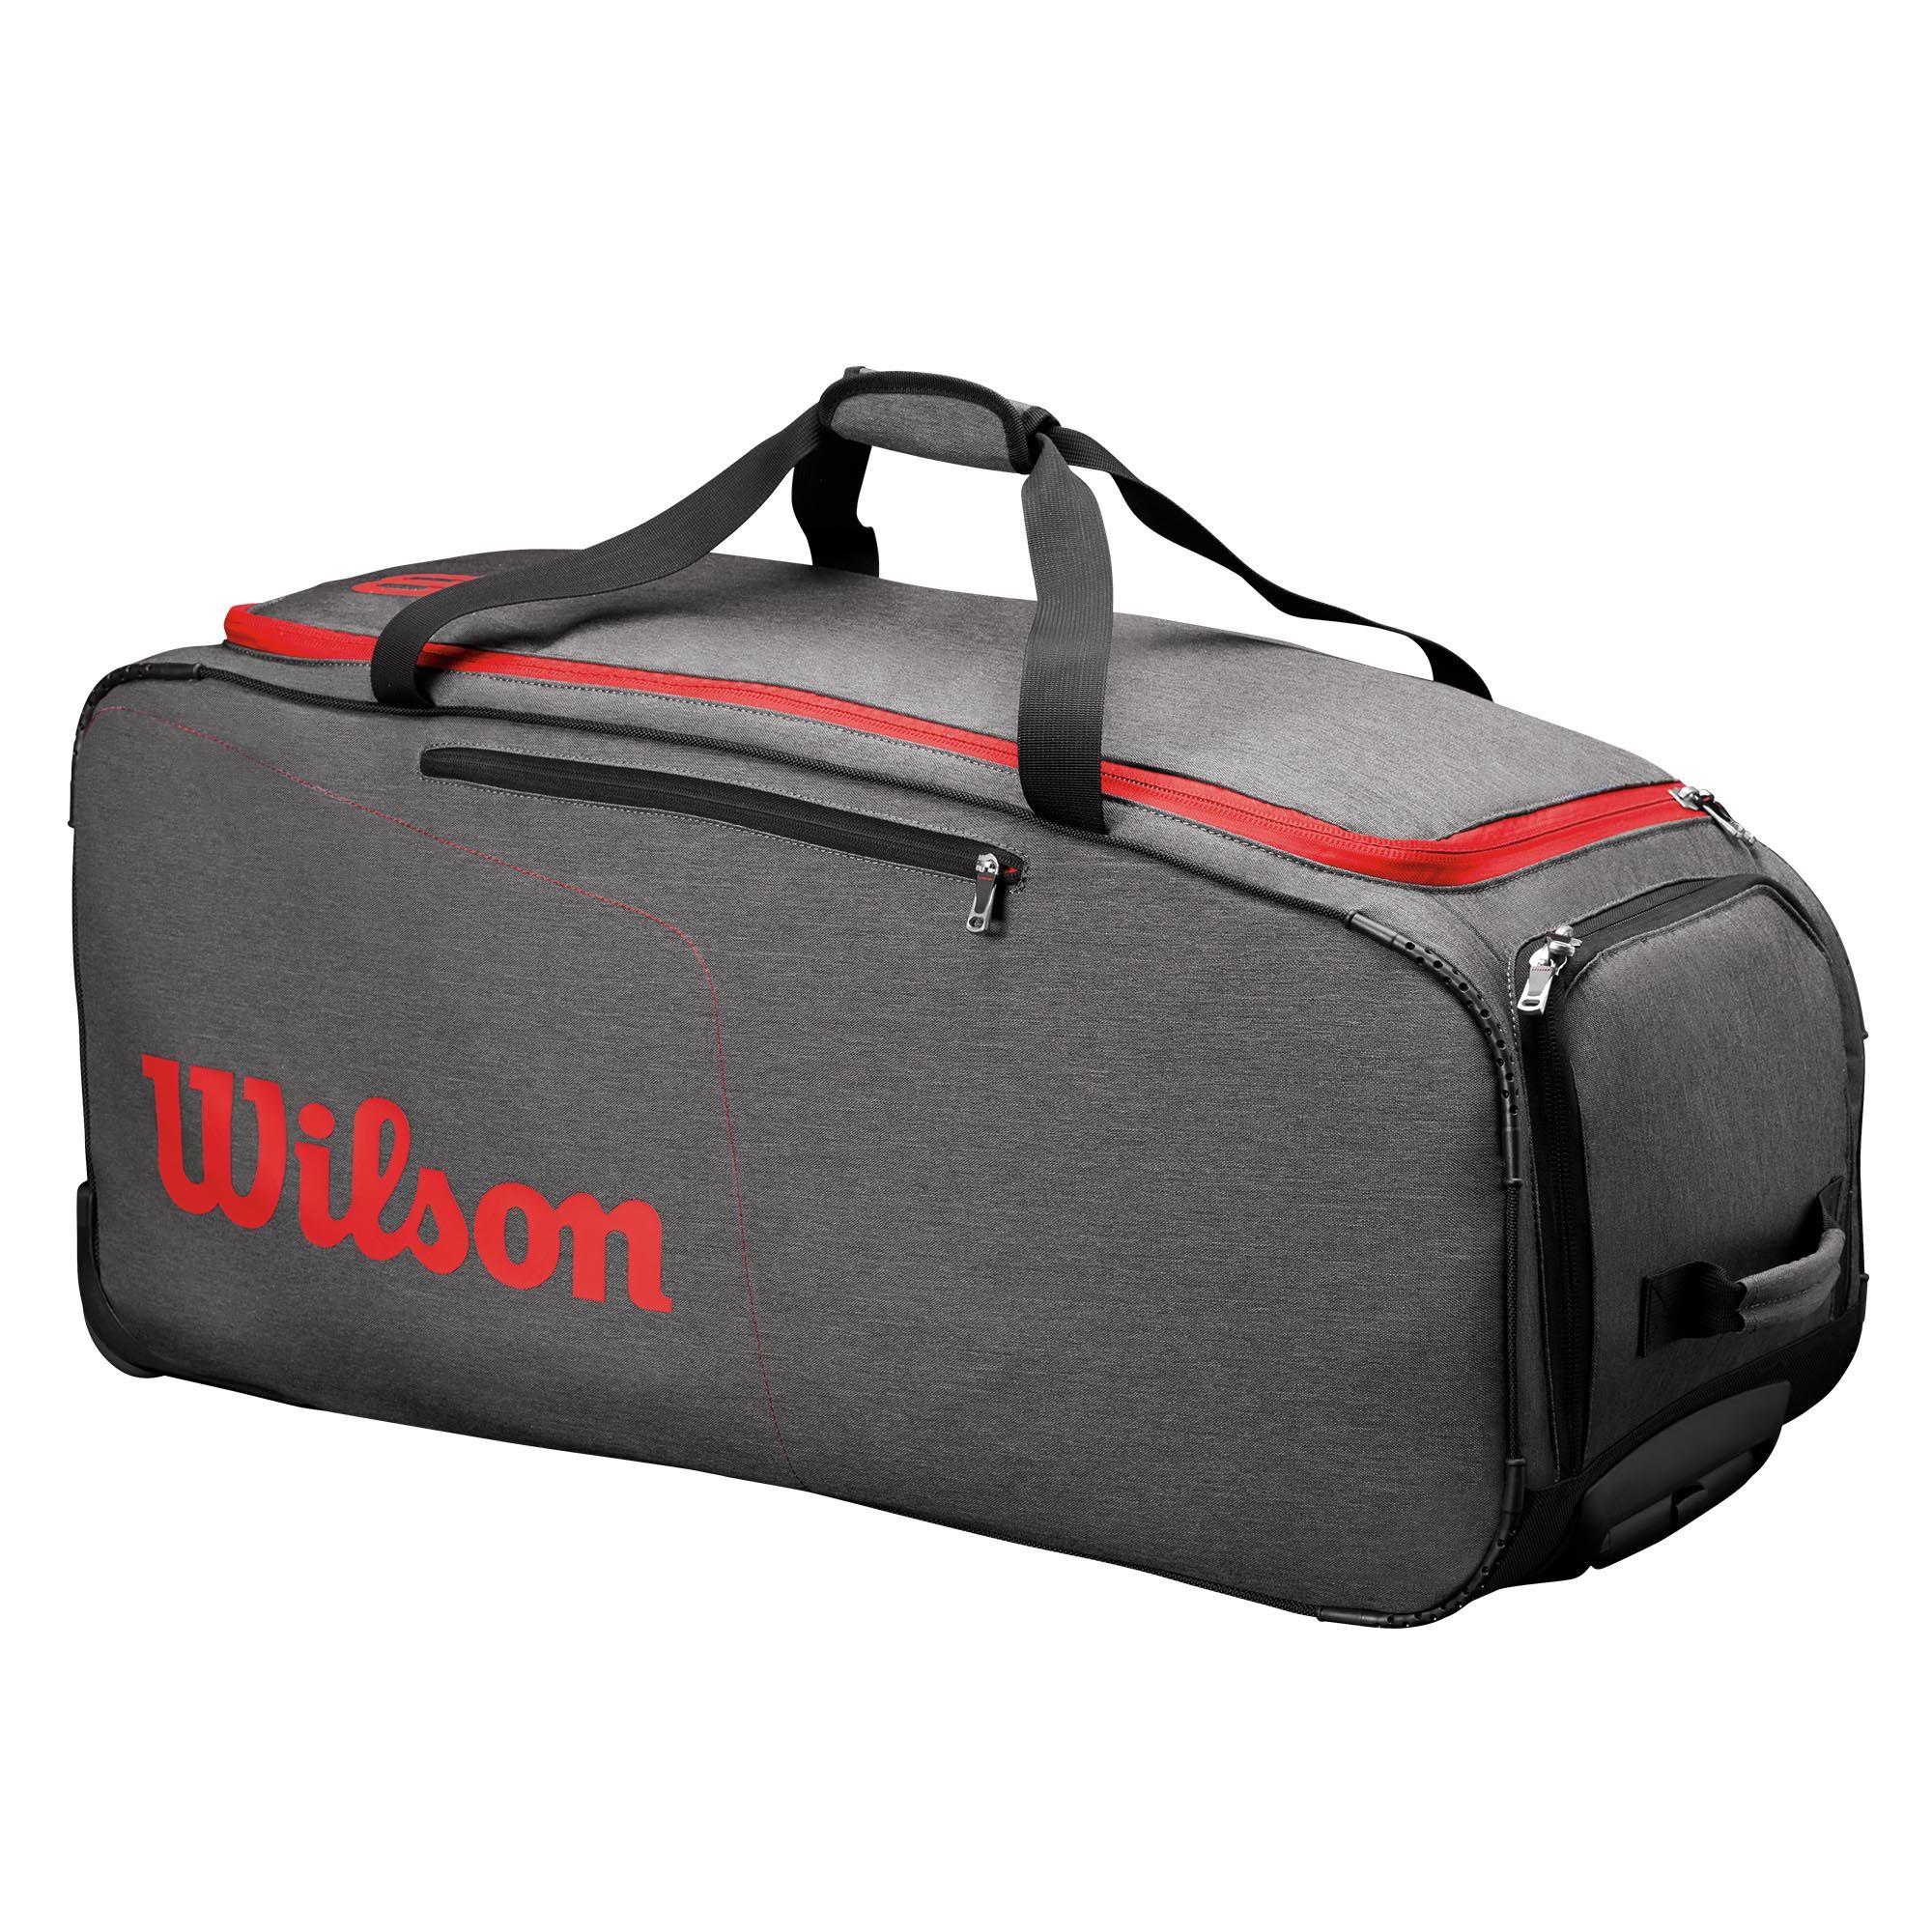 Wilson Traveler Wheeled Coach Duffle Bag Sweatband Com